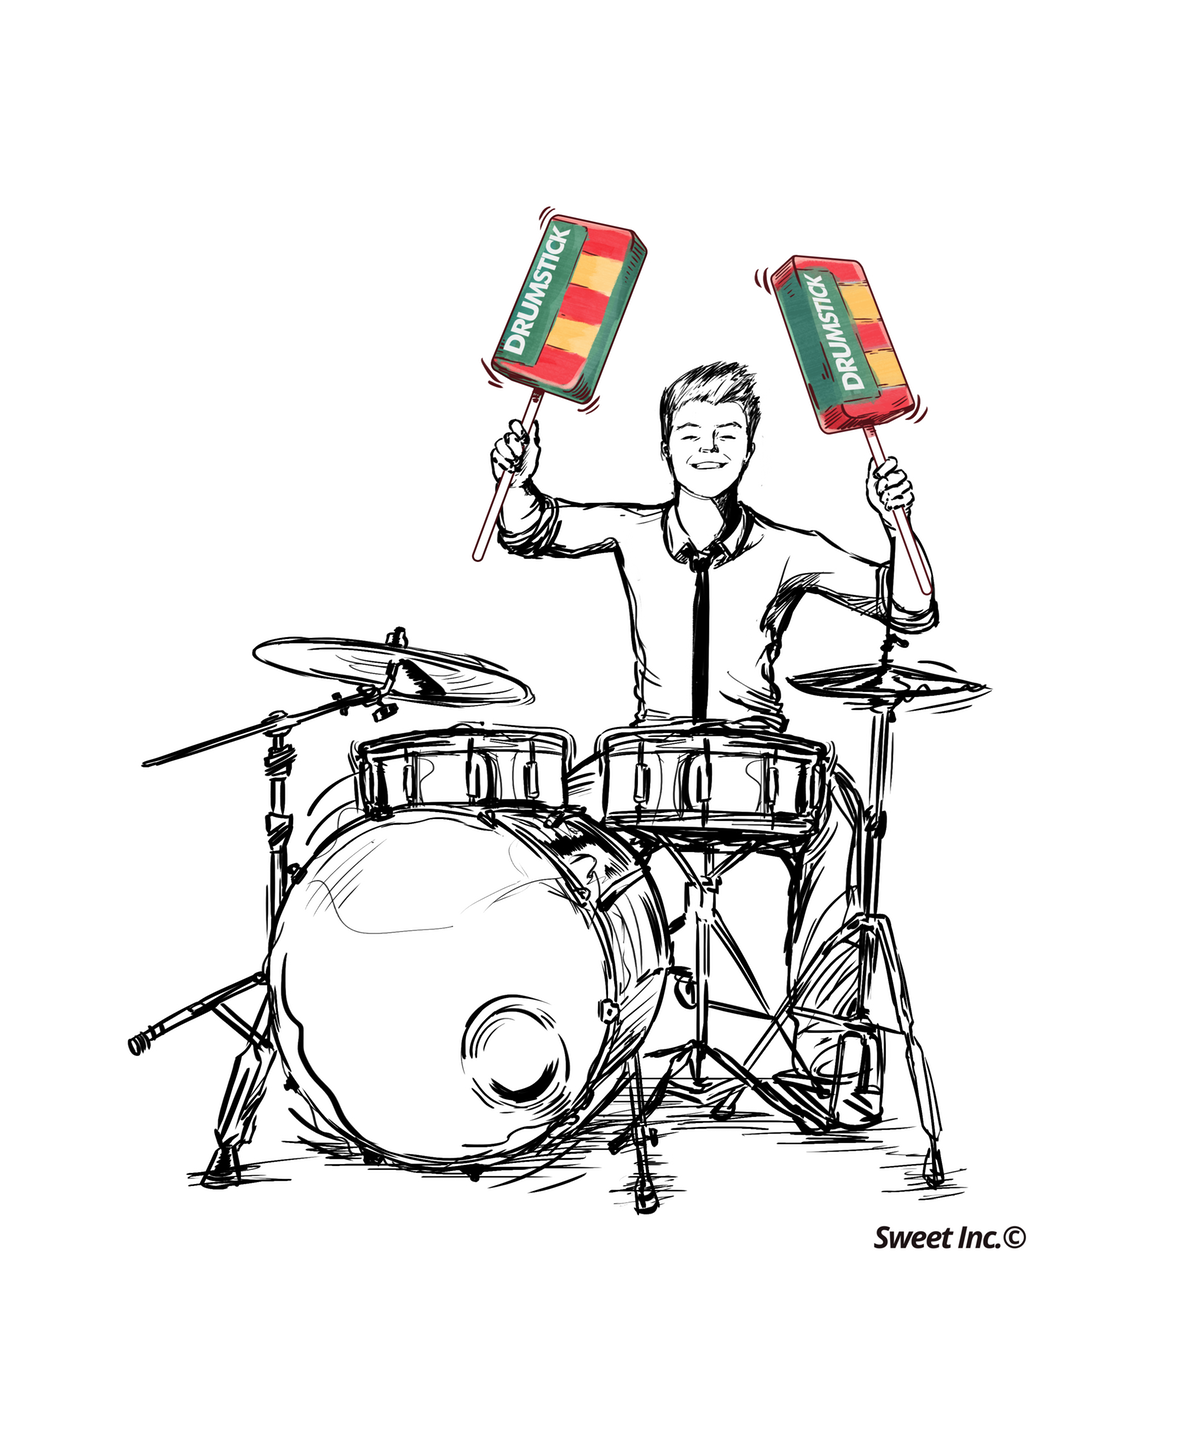 Drum kit with a twist